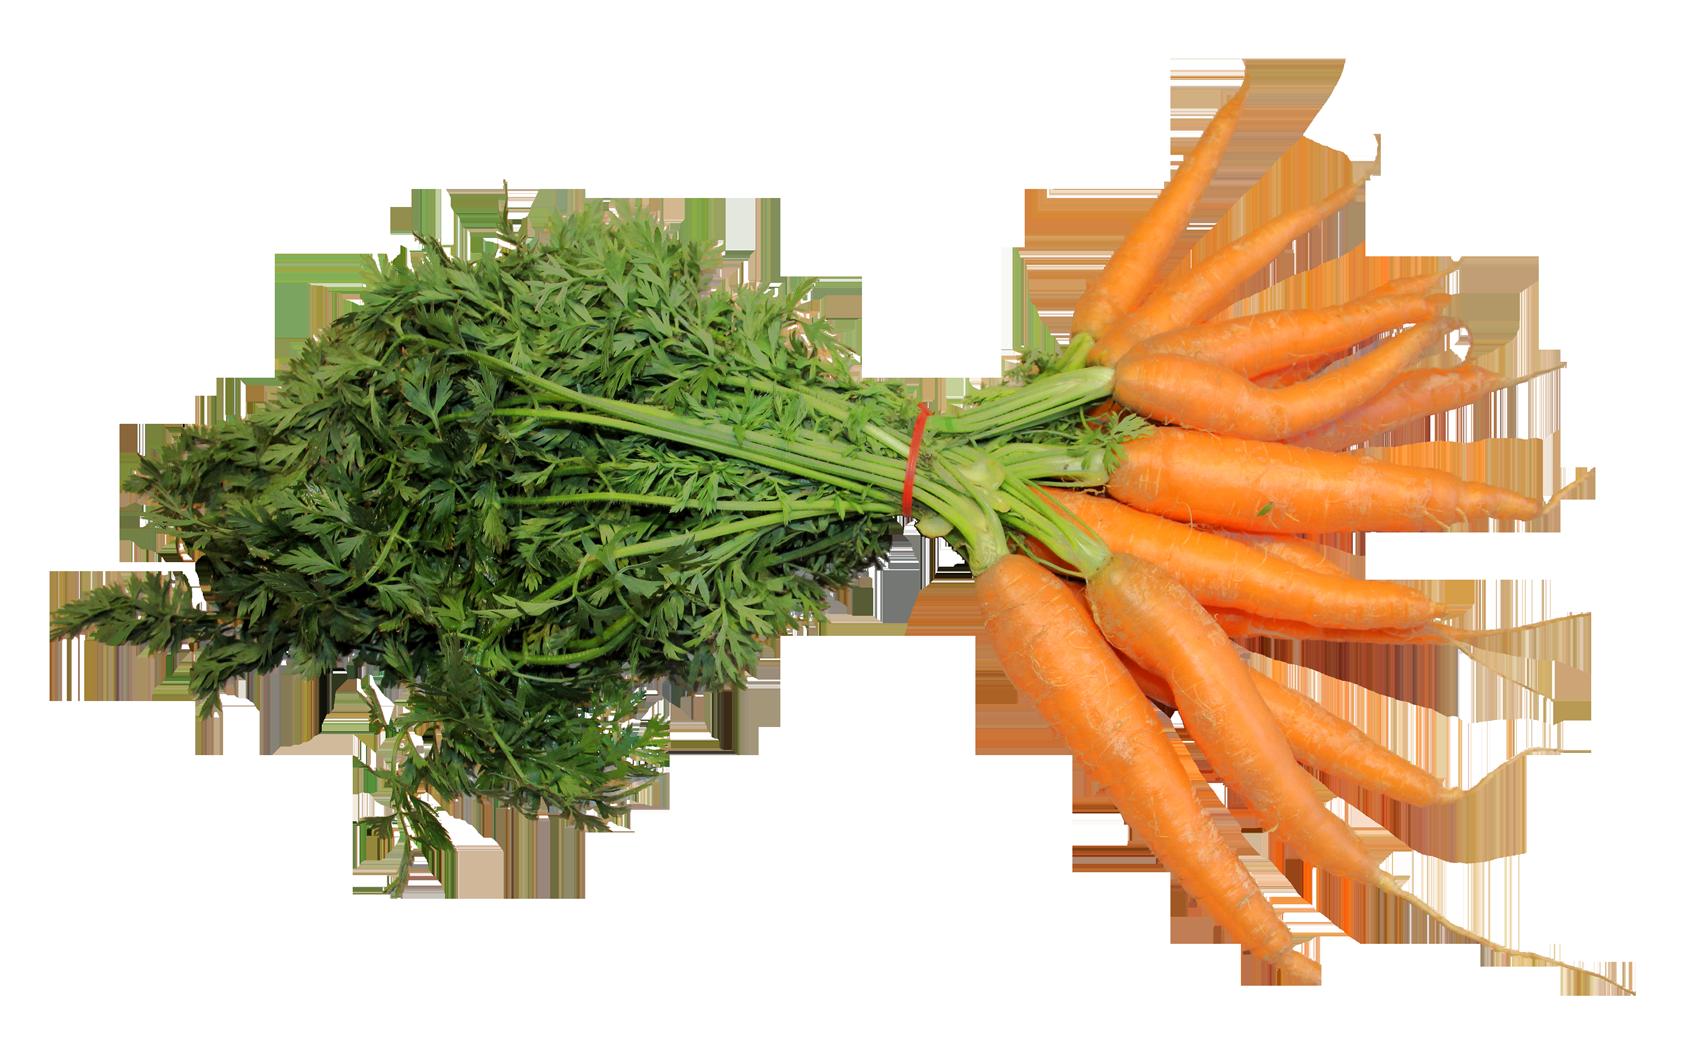 Fresh Carrot PNG Image